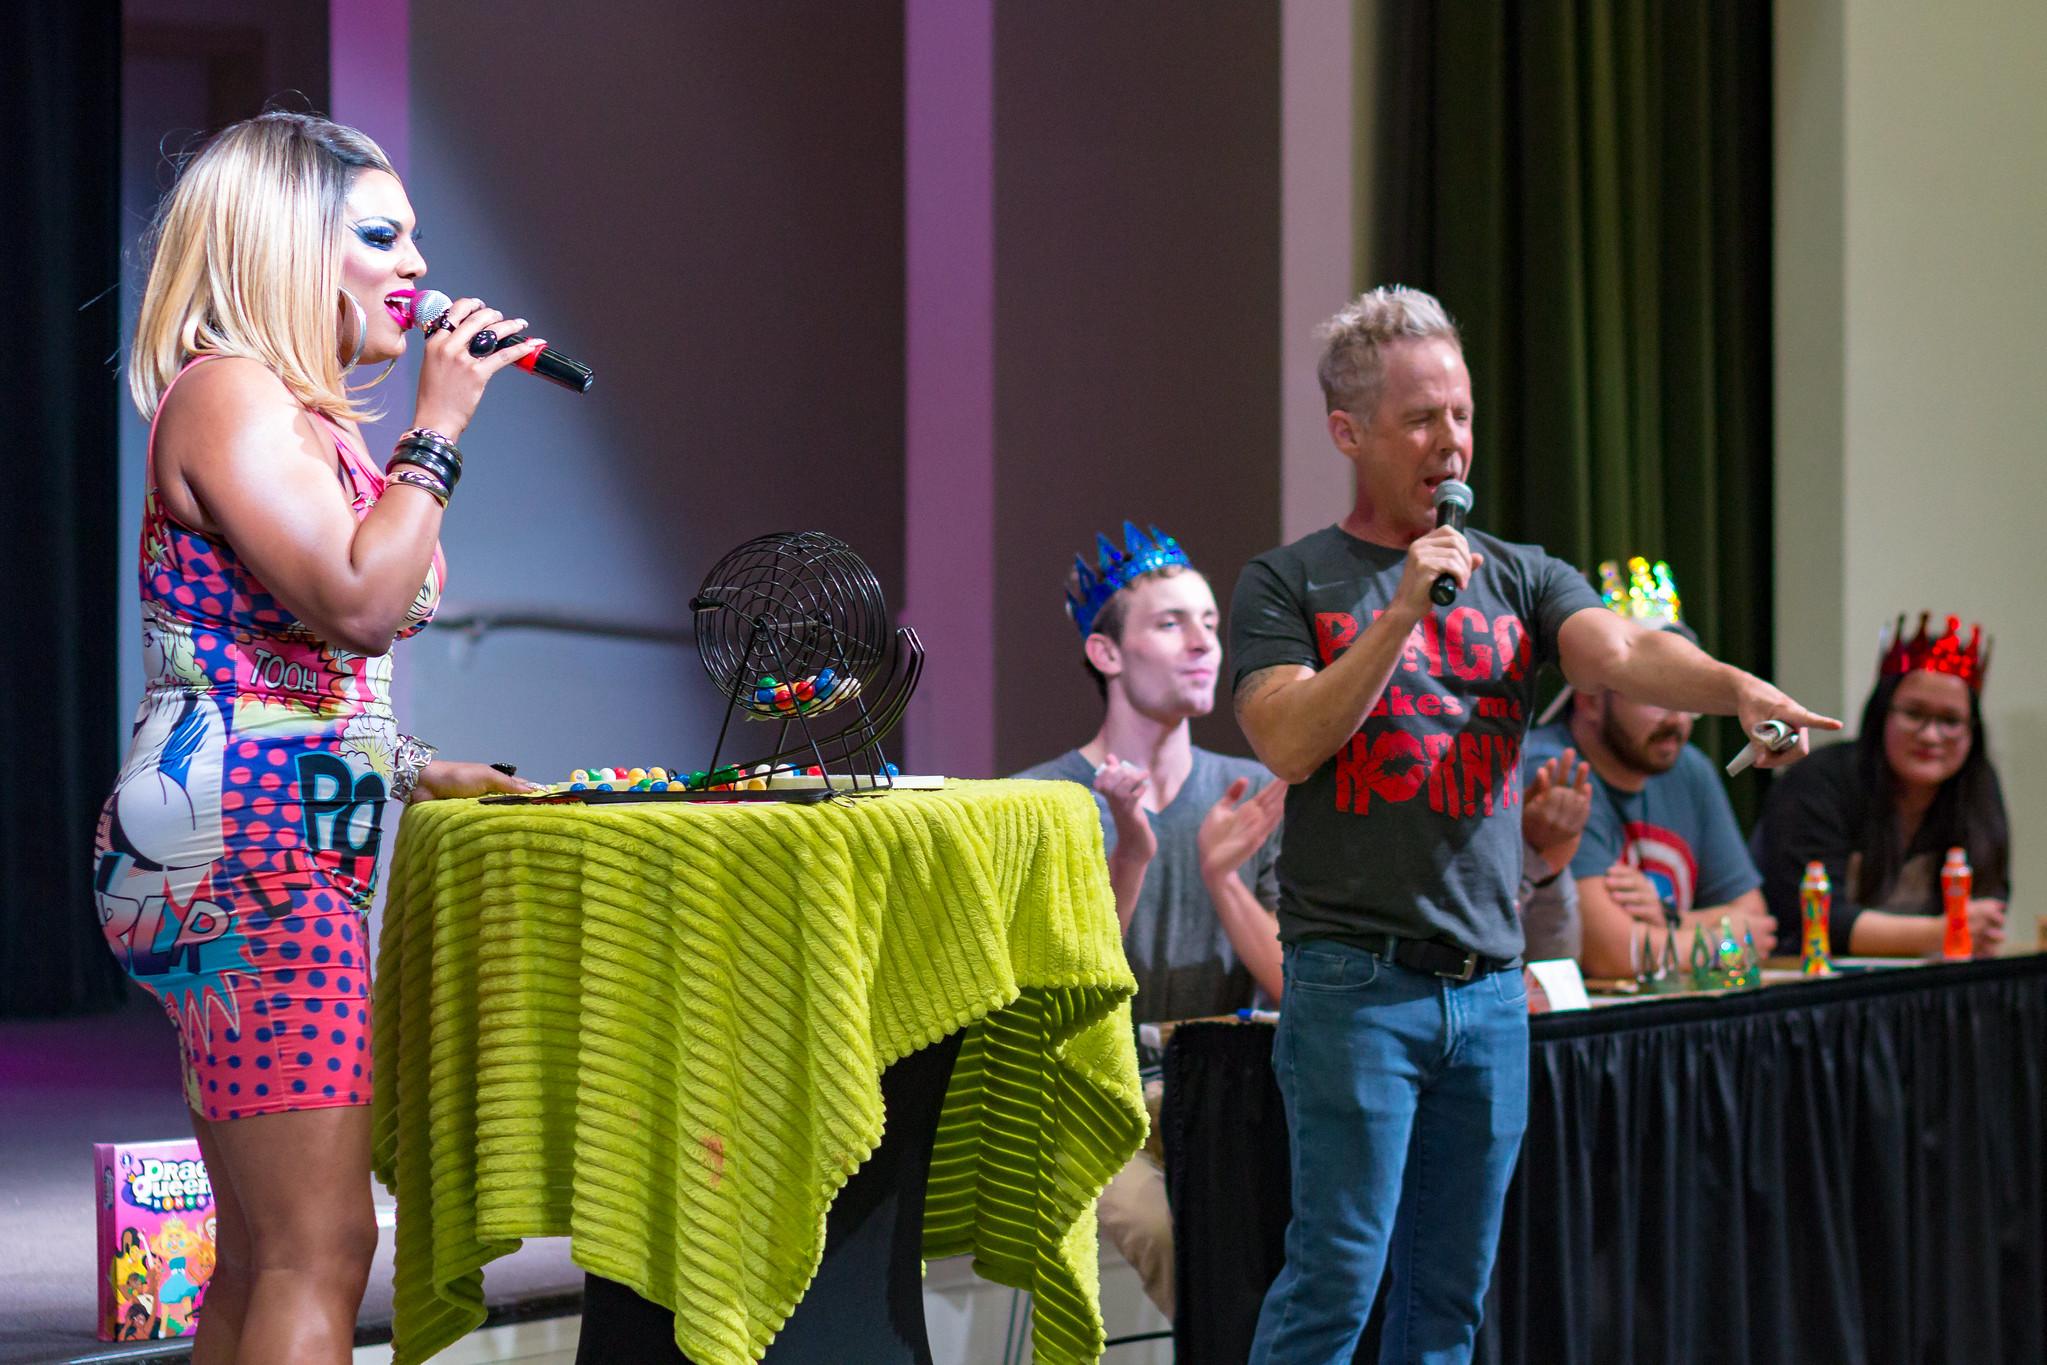 Image of Roxy Wood and co-host leading Drag Bingo.